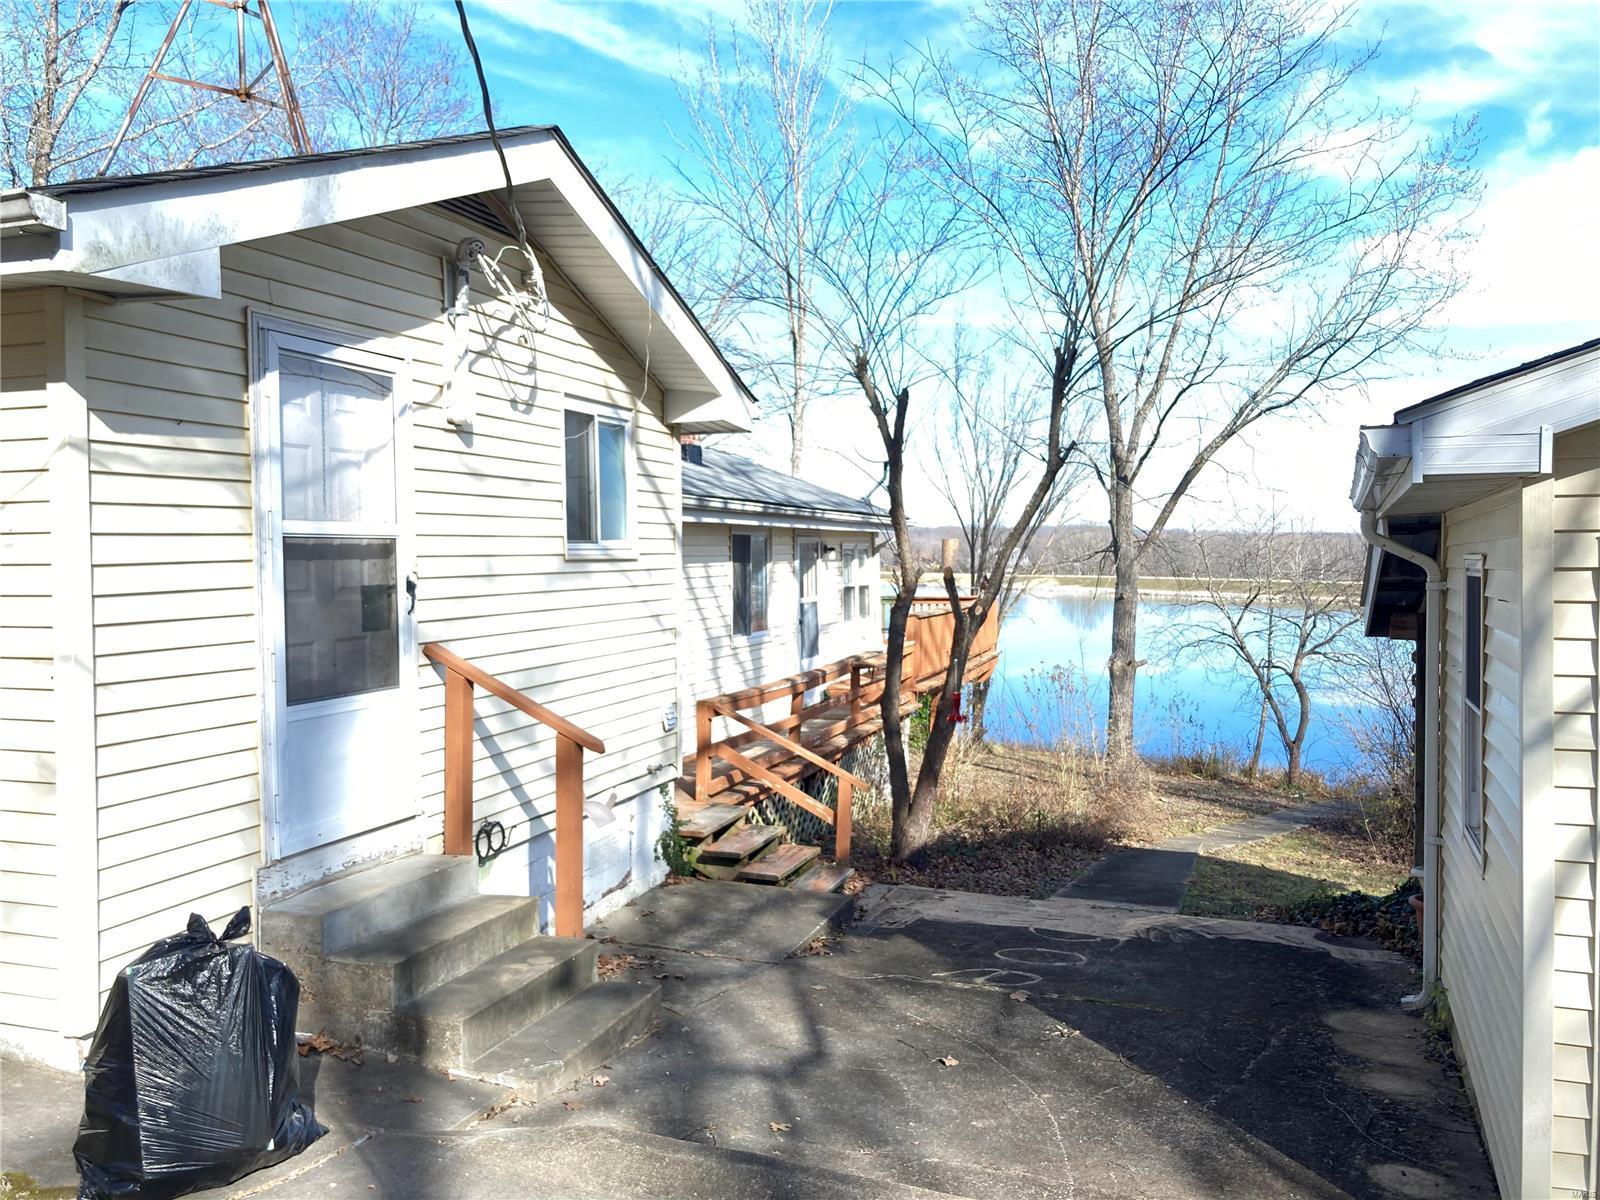 165 S Lake Property Photo - Leslie, MO real estate listing